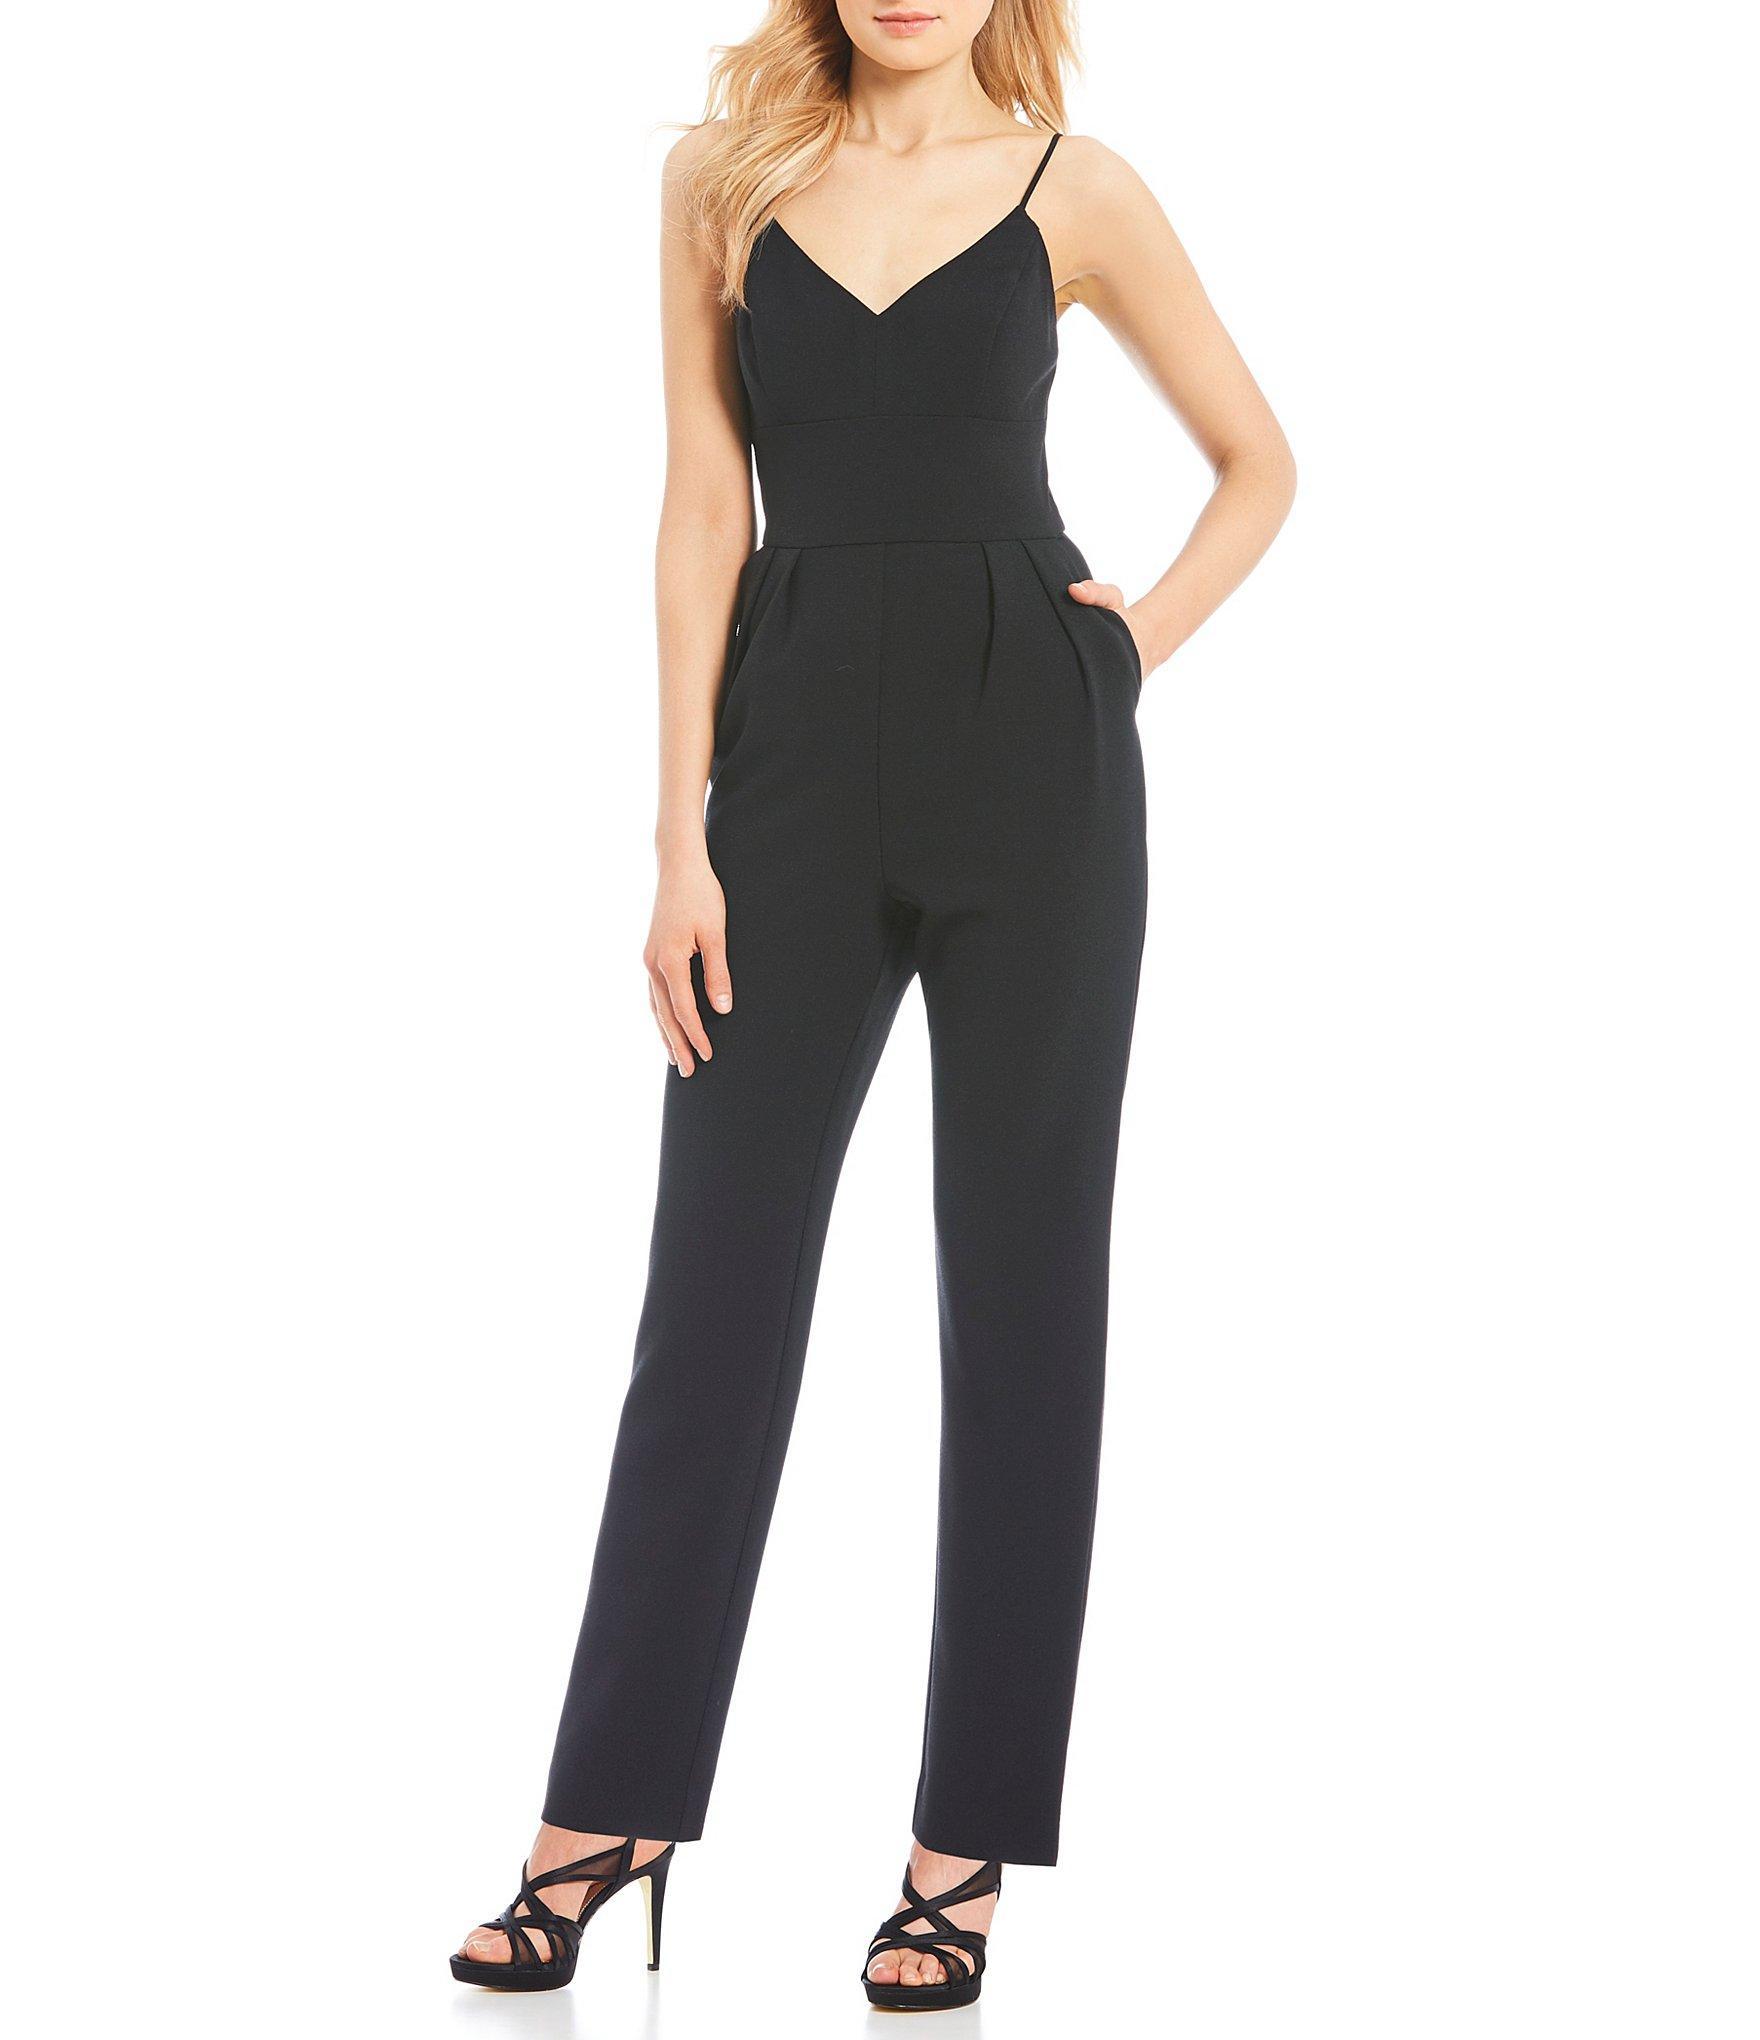 70245f5cedd Lyst - Eliza J Spaghetti Strap V-neck Jumpsuit in Black